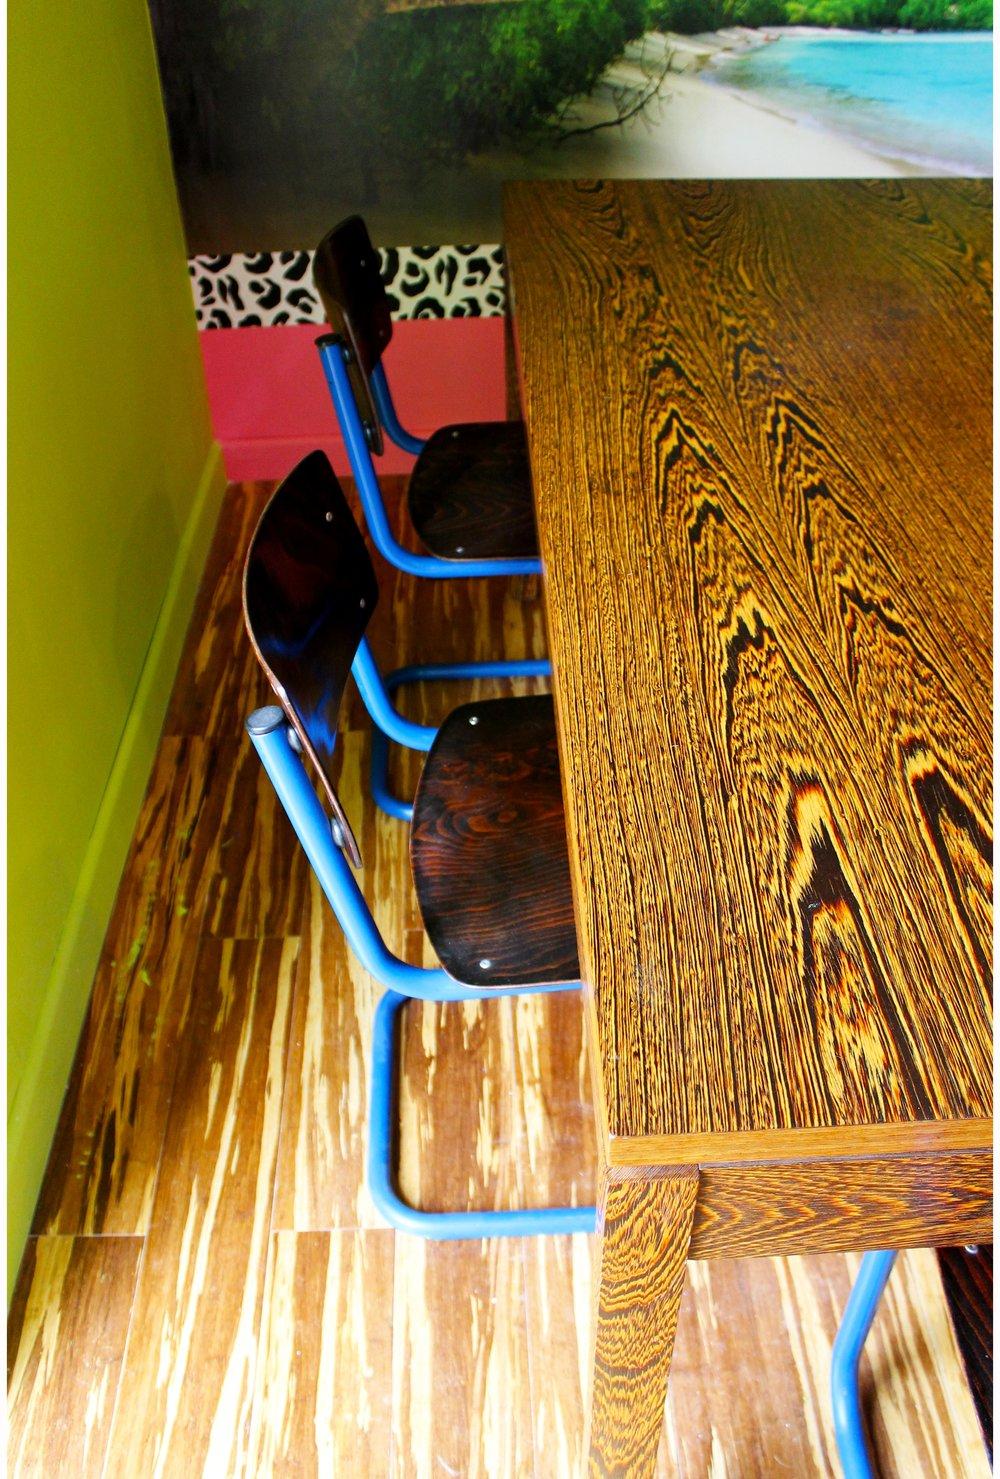 Kitchen Table Chairs w border.jpg